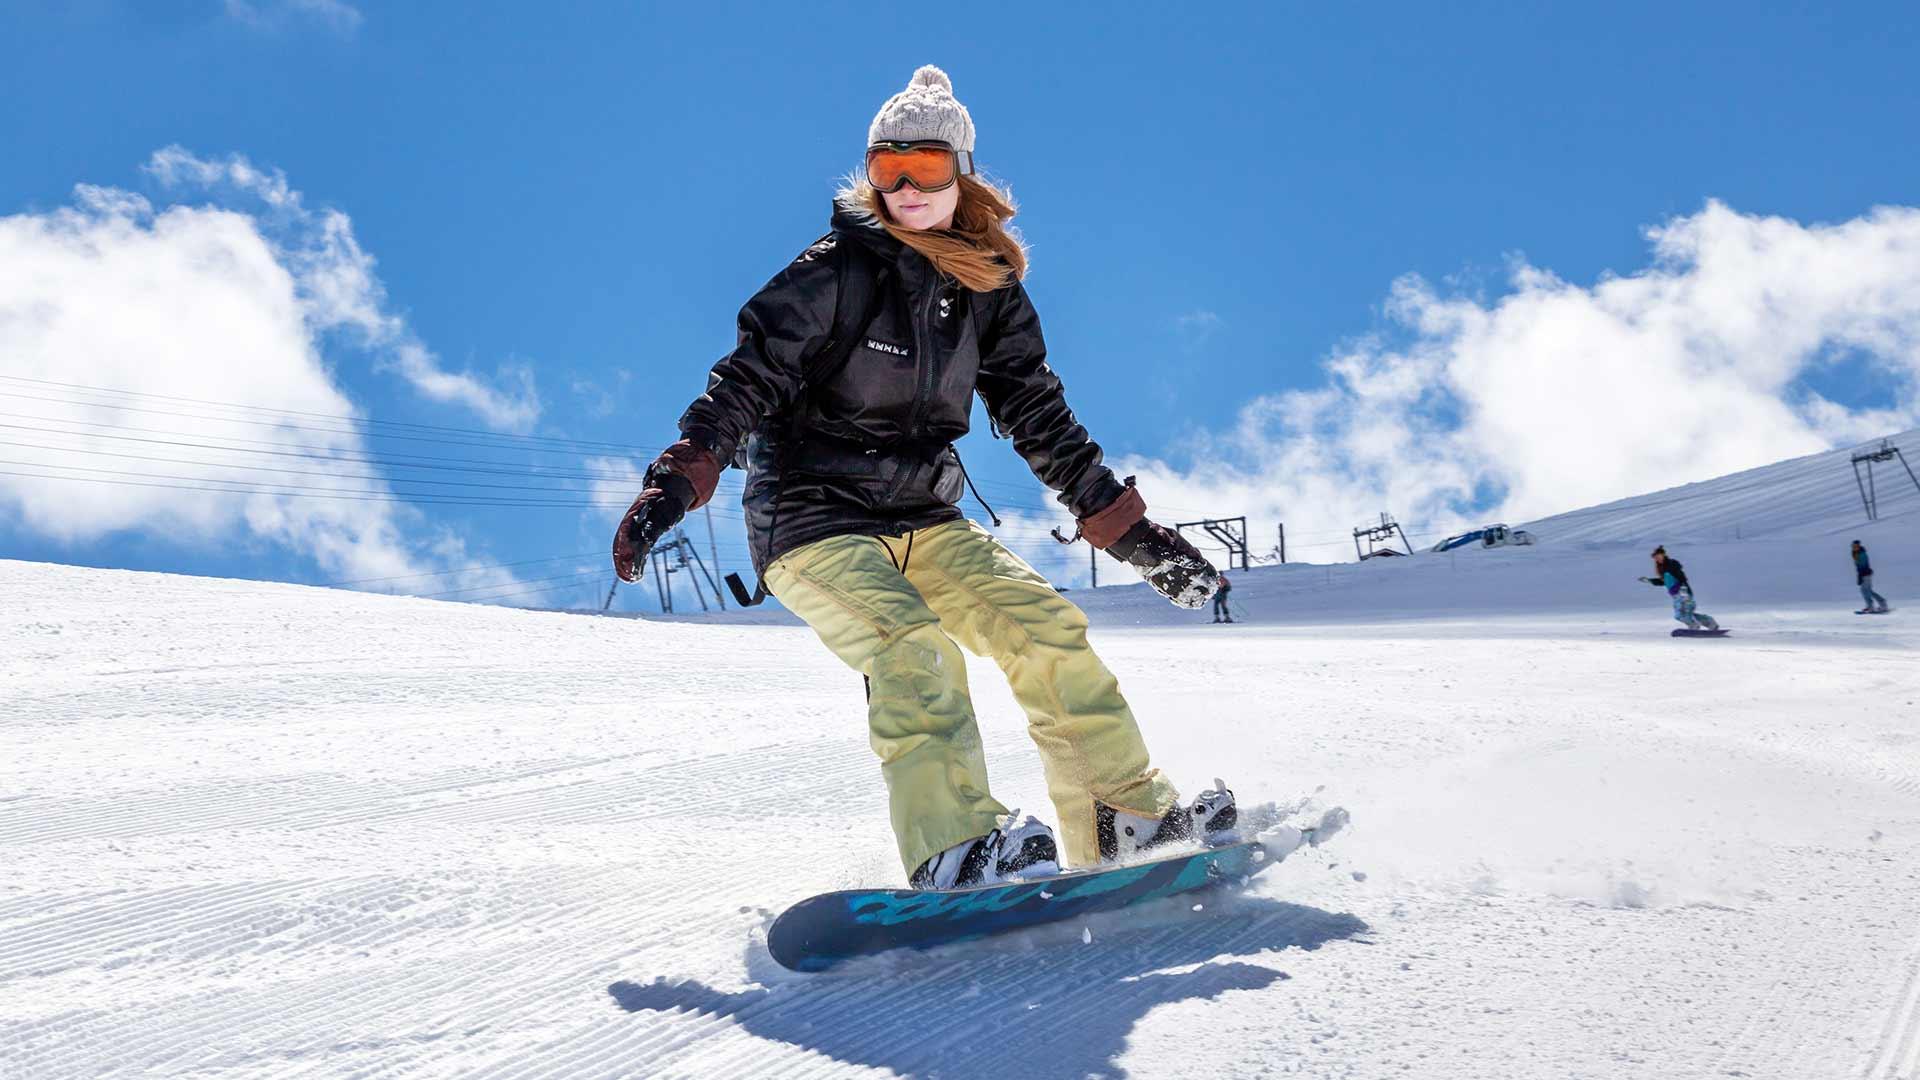 Vacanza sciistica a Merano e dintorni - Snowboarden